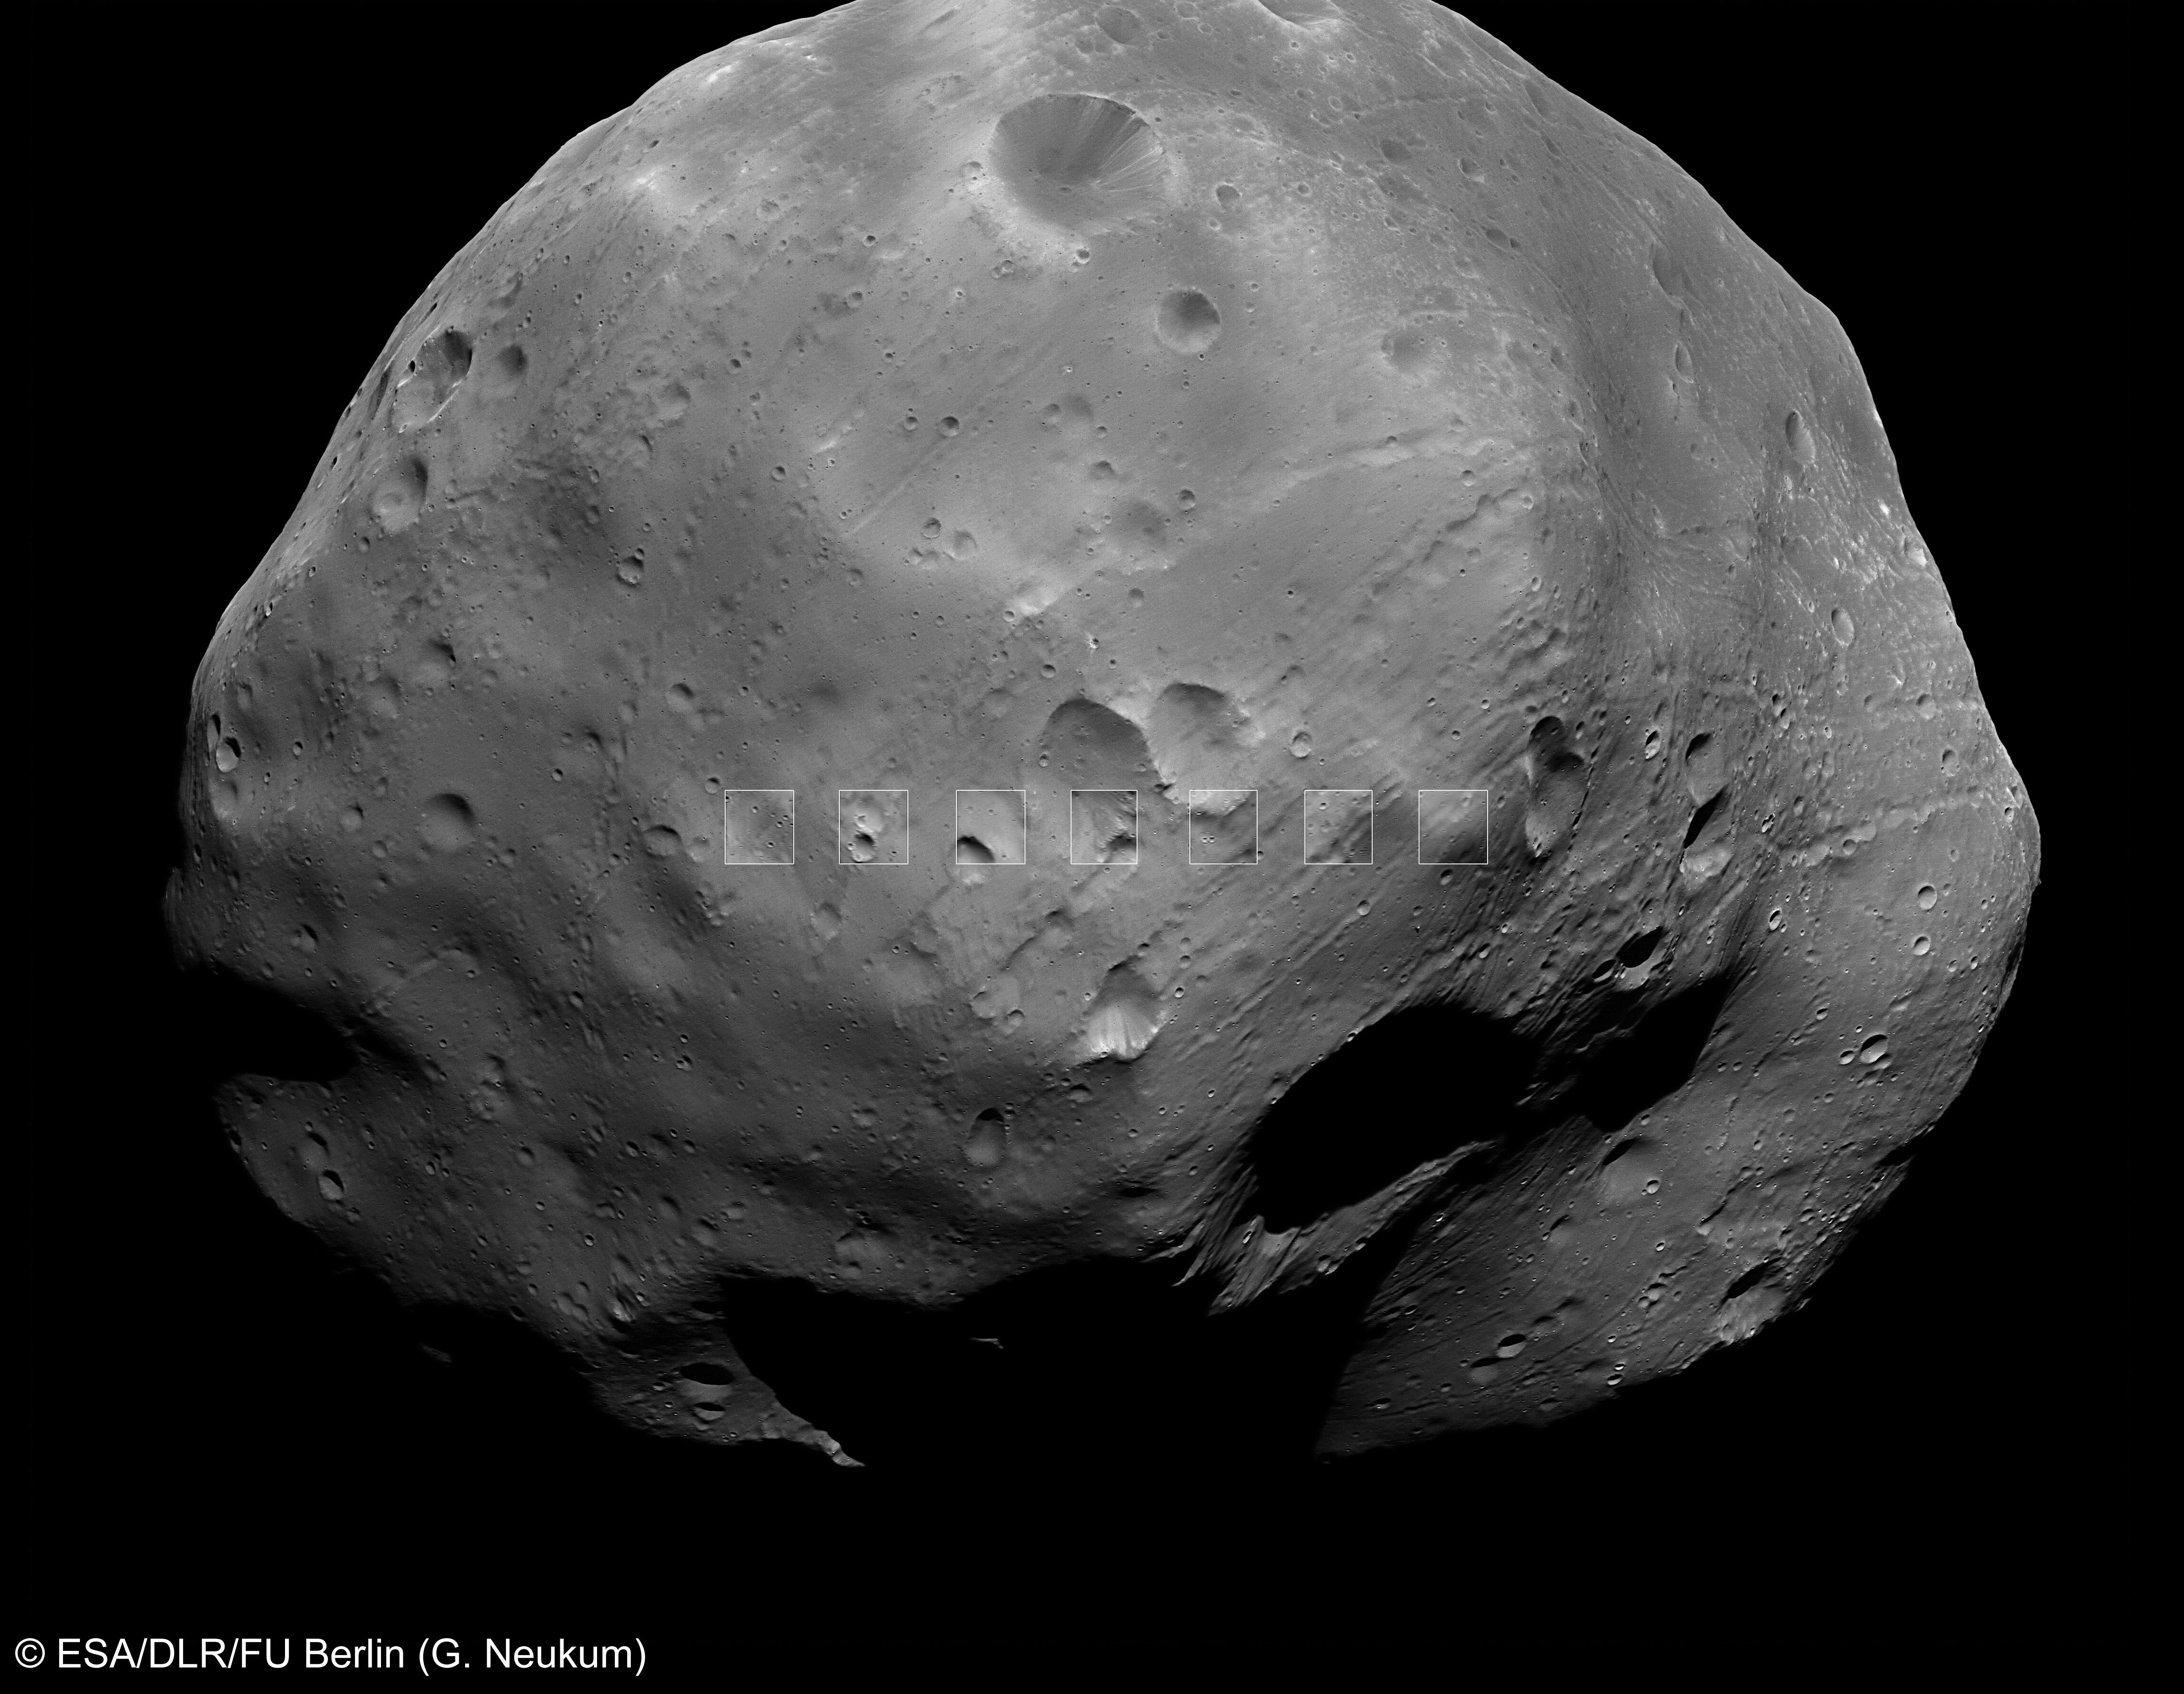 1567218436163-image4-492-20110120-8974-SRCimages-04-PhobosFlyby.jpg